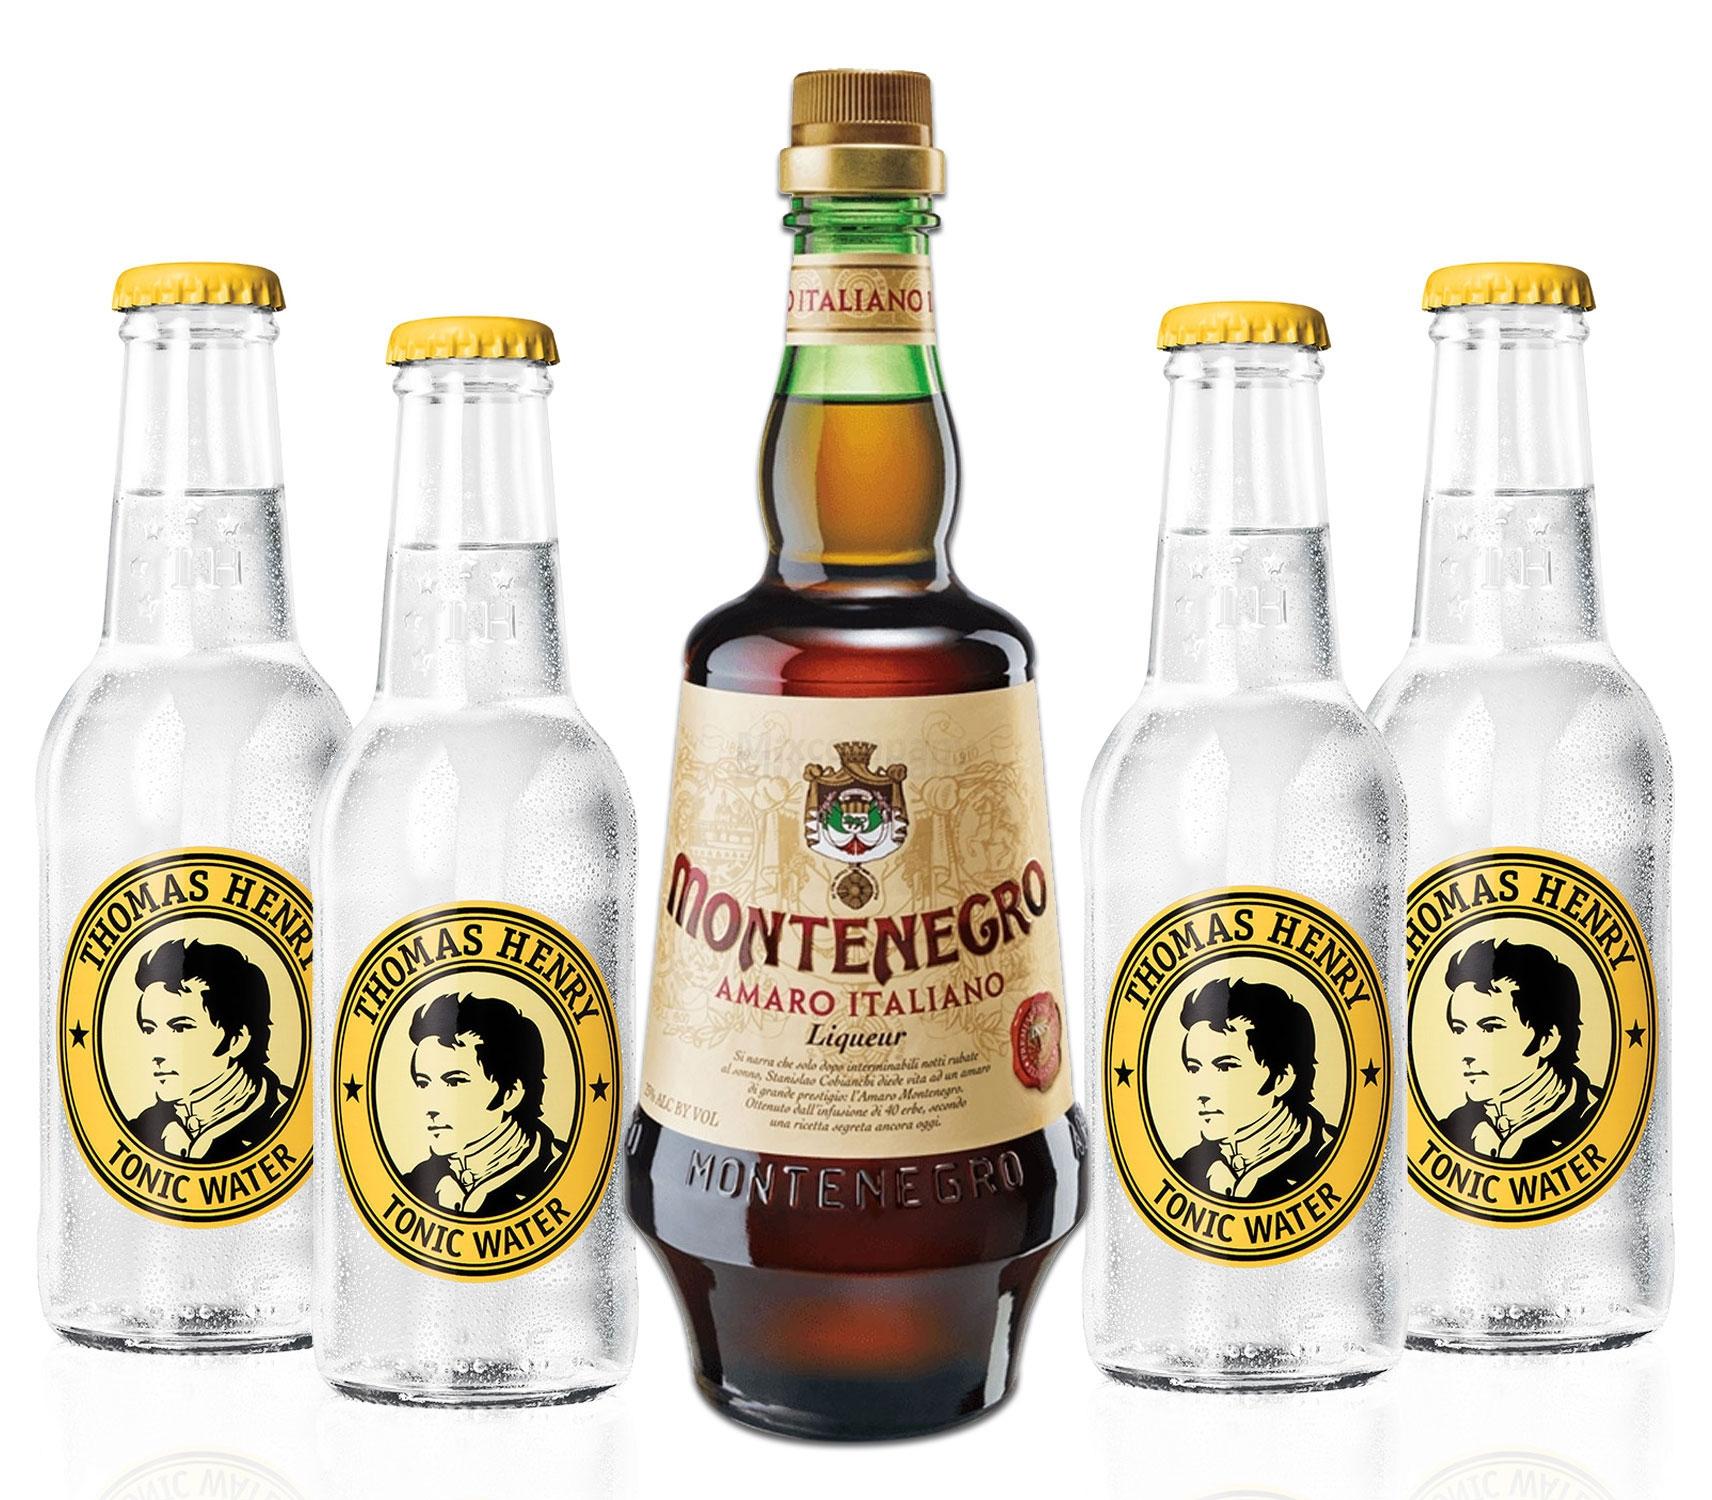 Montenegro & Tonic Set - Montenegro Amaro Italiano Likör 0,7L (23% Vol) + 4x Thomas Henry Tonic Water 200ml inkl. Pfand MEHRWEG